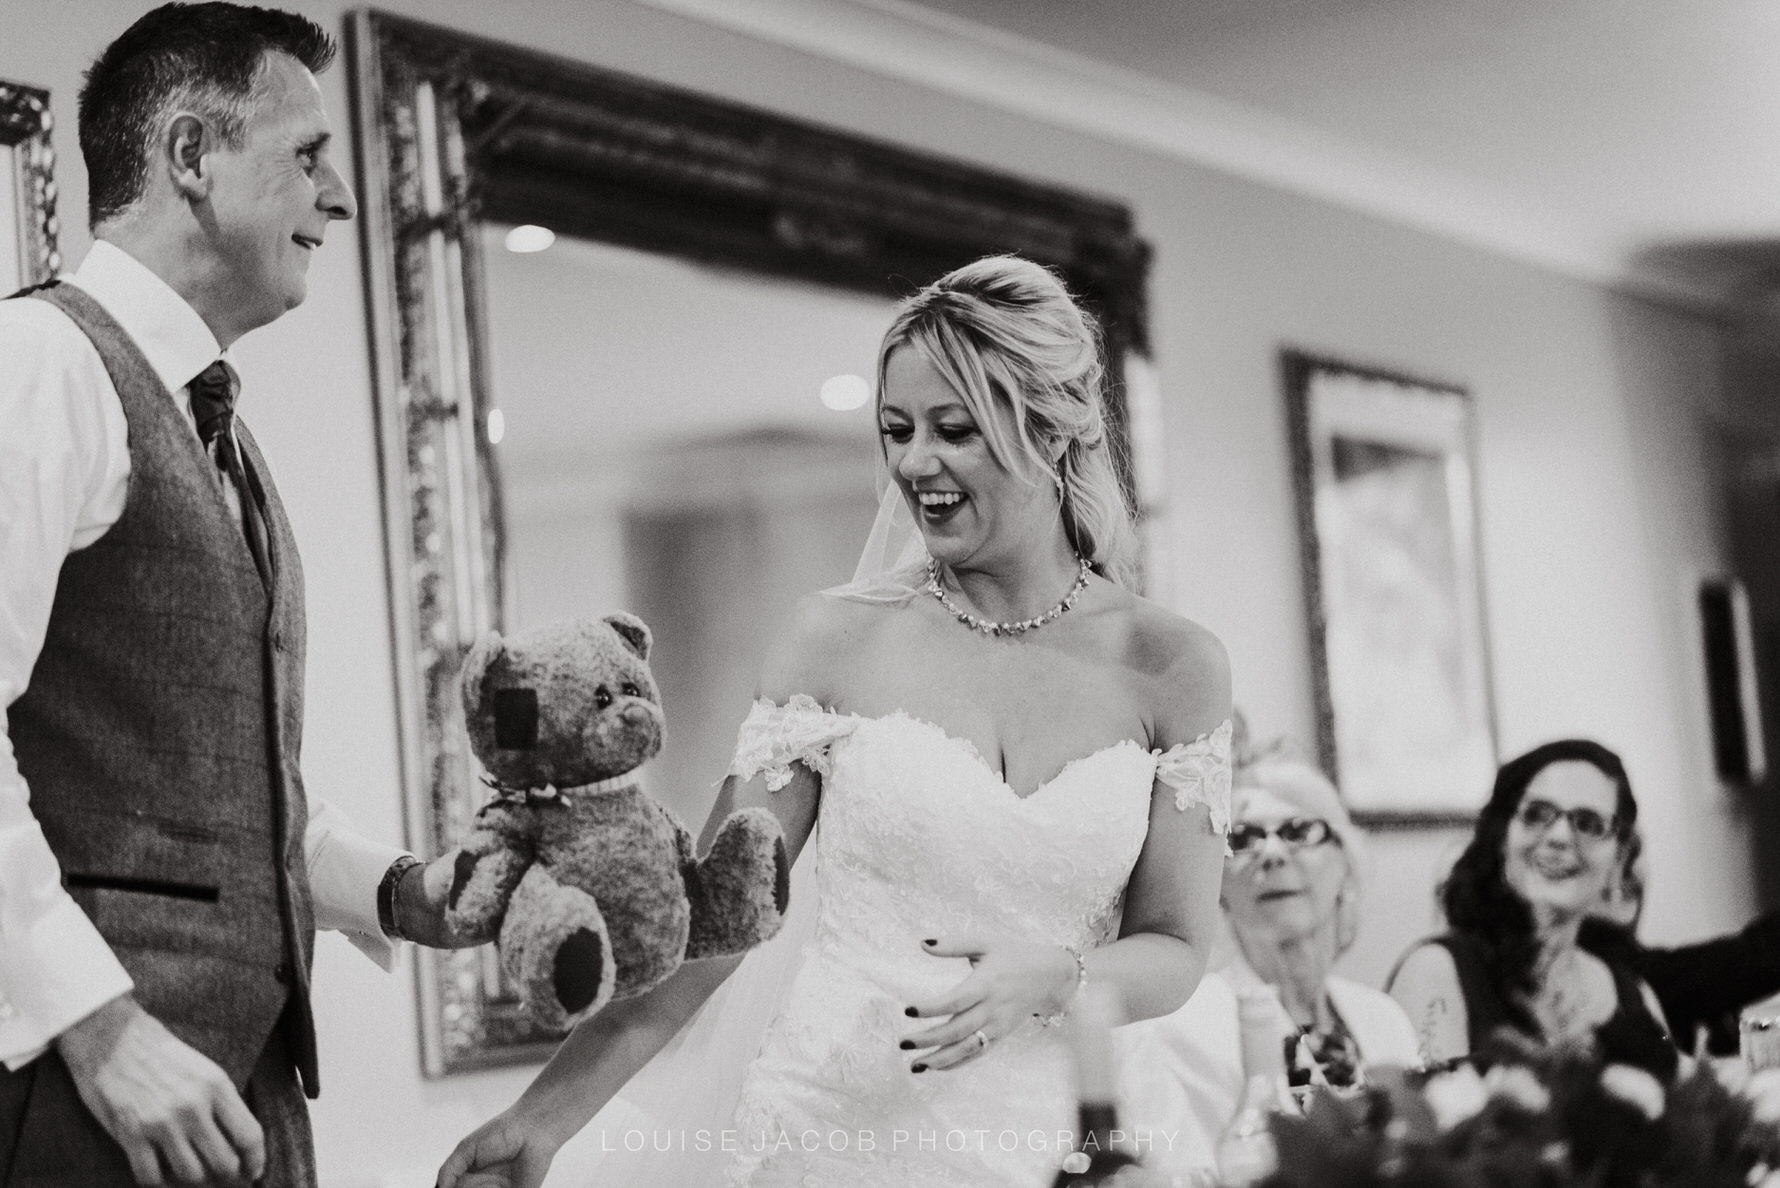 Cheshire Unposed Documentary Wedding Photography at The Stone House Hotel